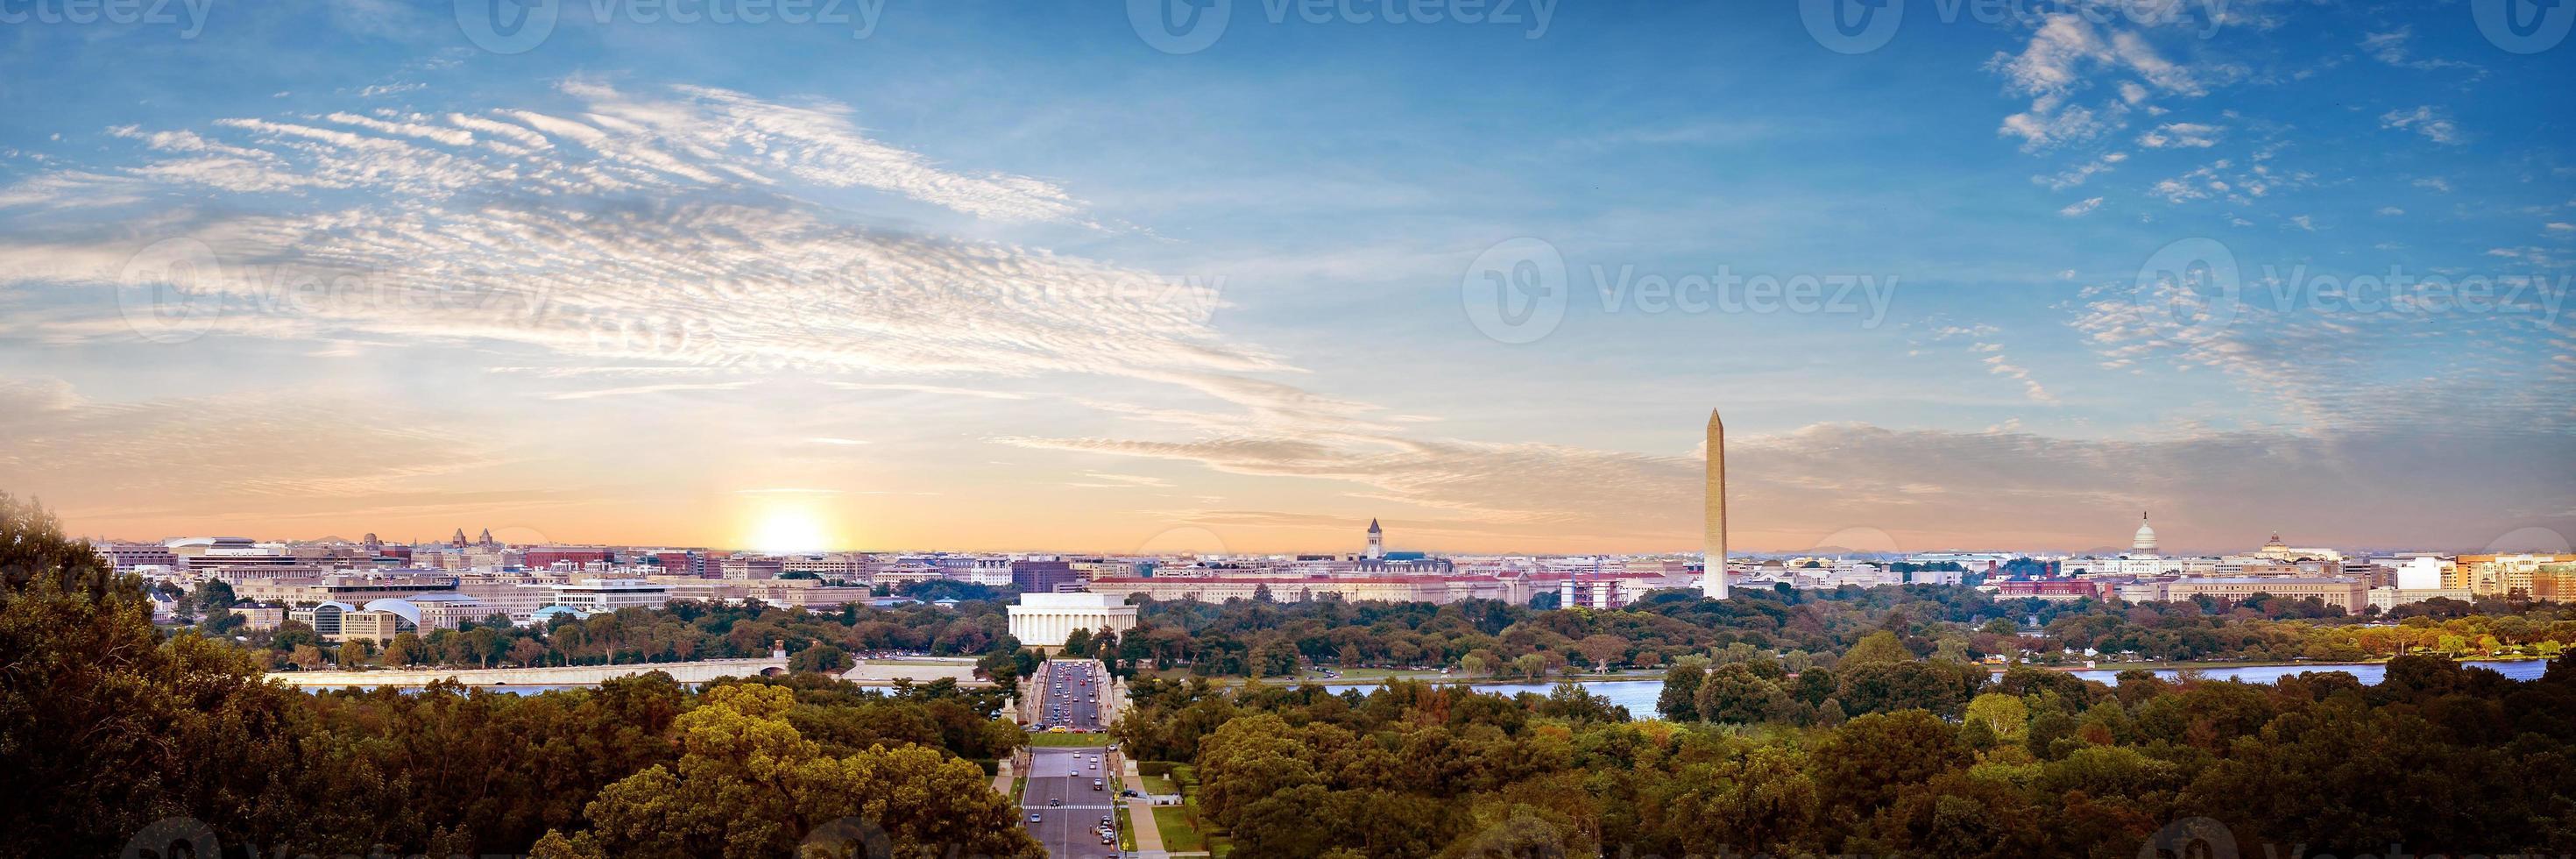 panoramautsikt över washington dc skyline, washington dc, usa foto